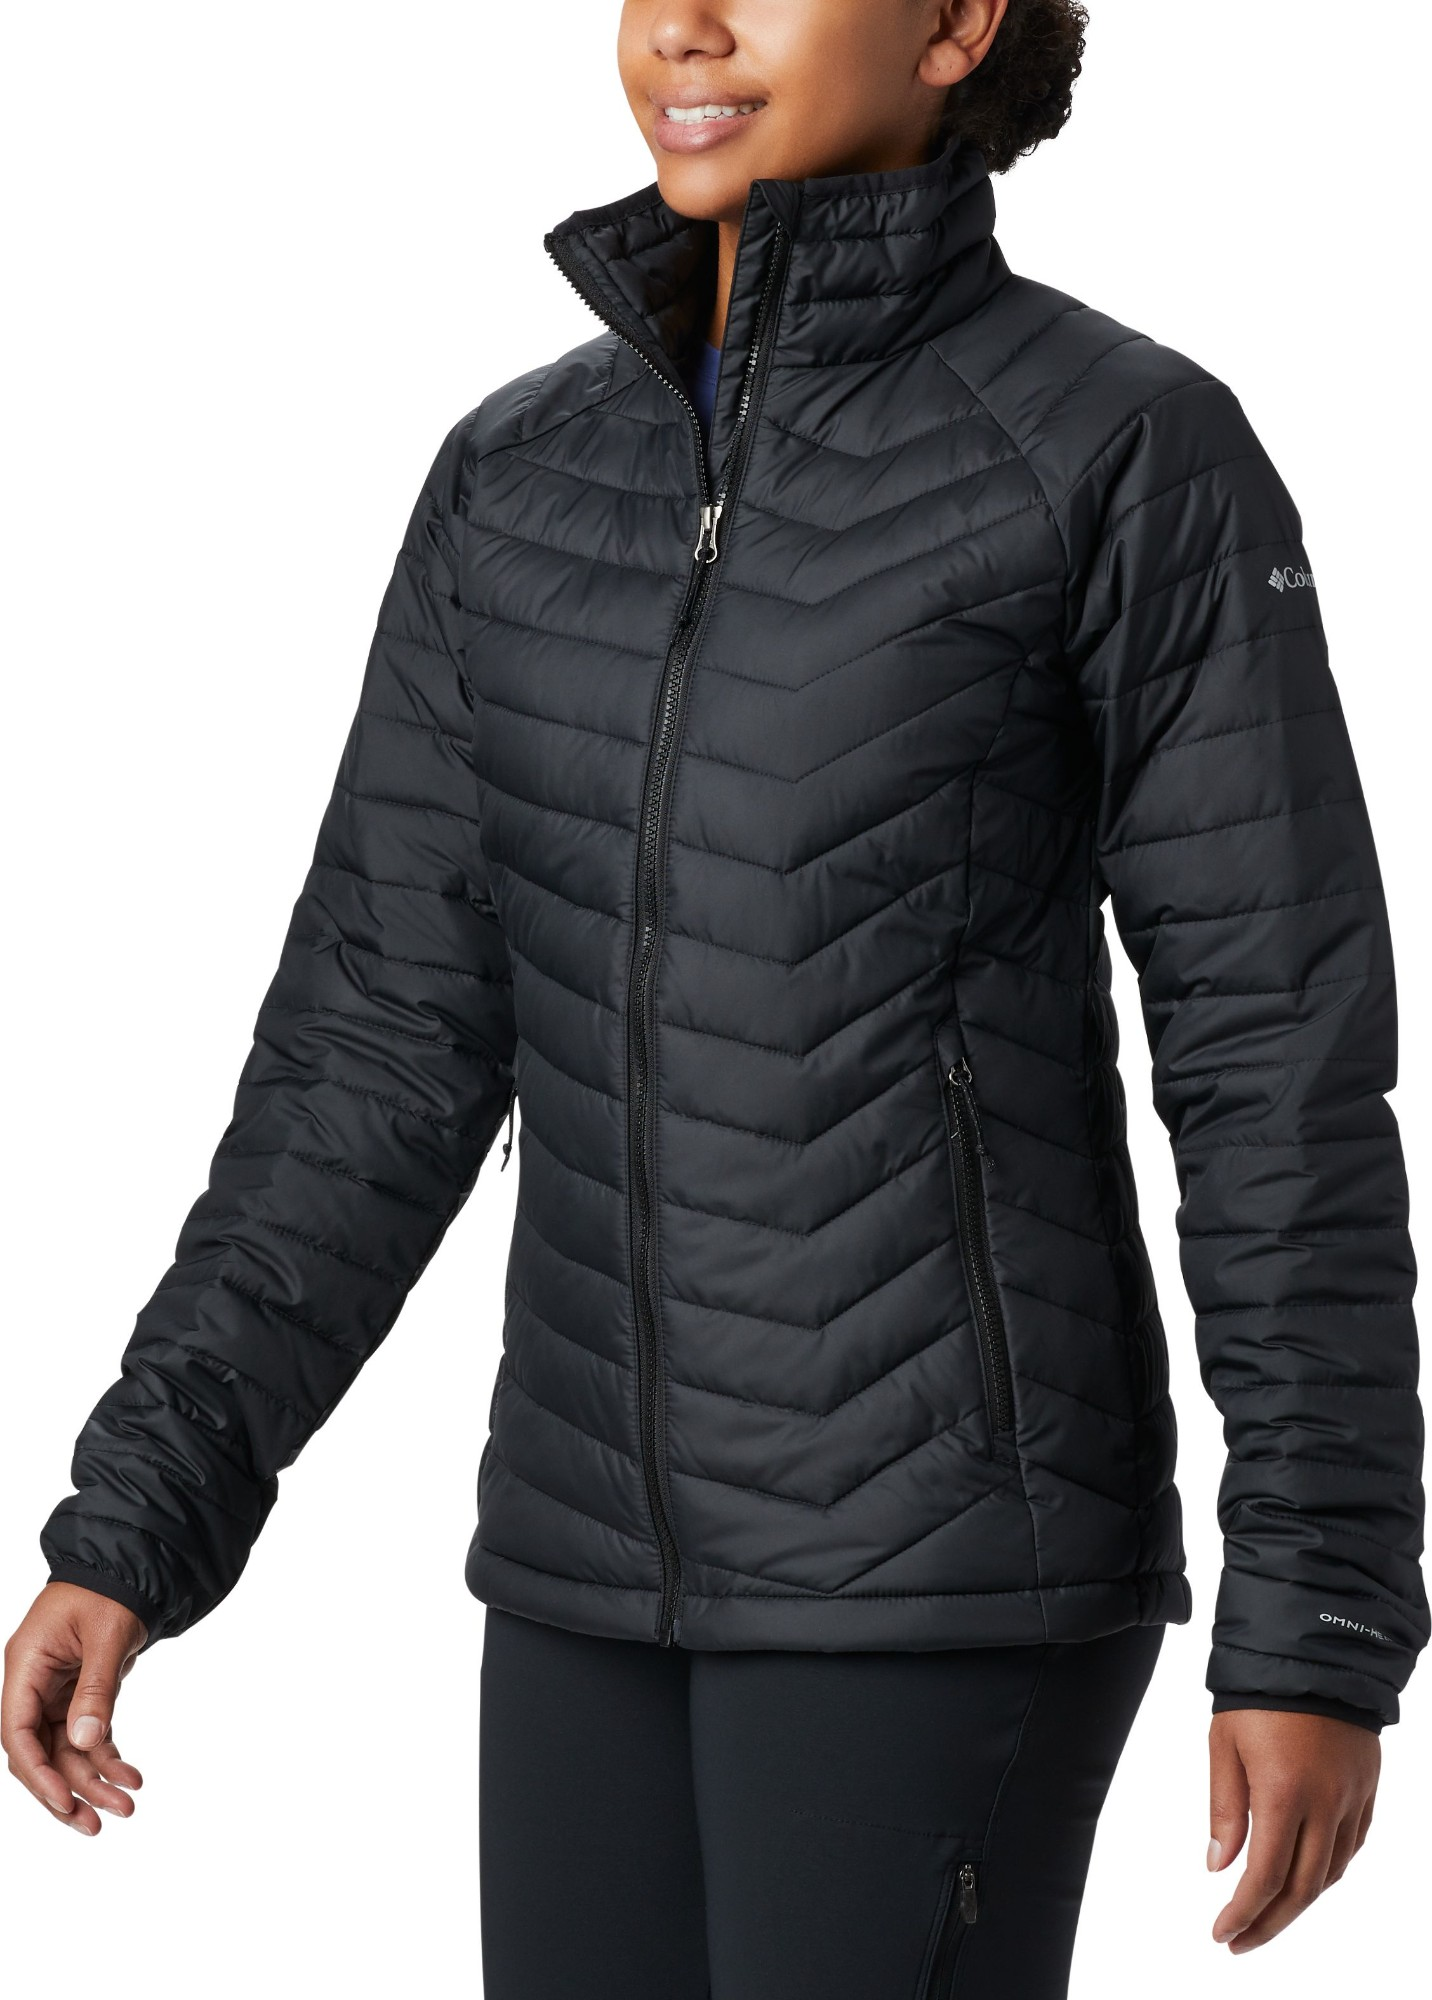 Columbia Powder Lite Jacket Women's Black M